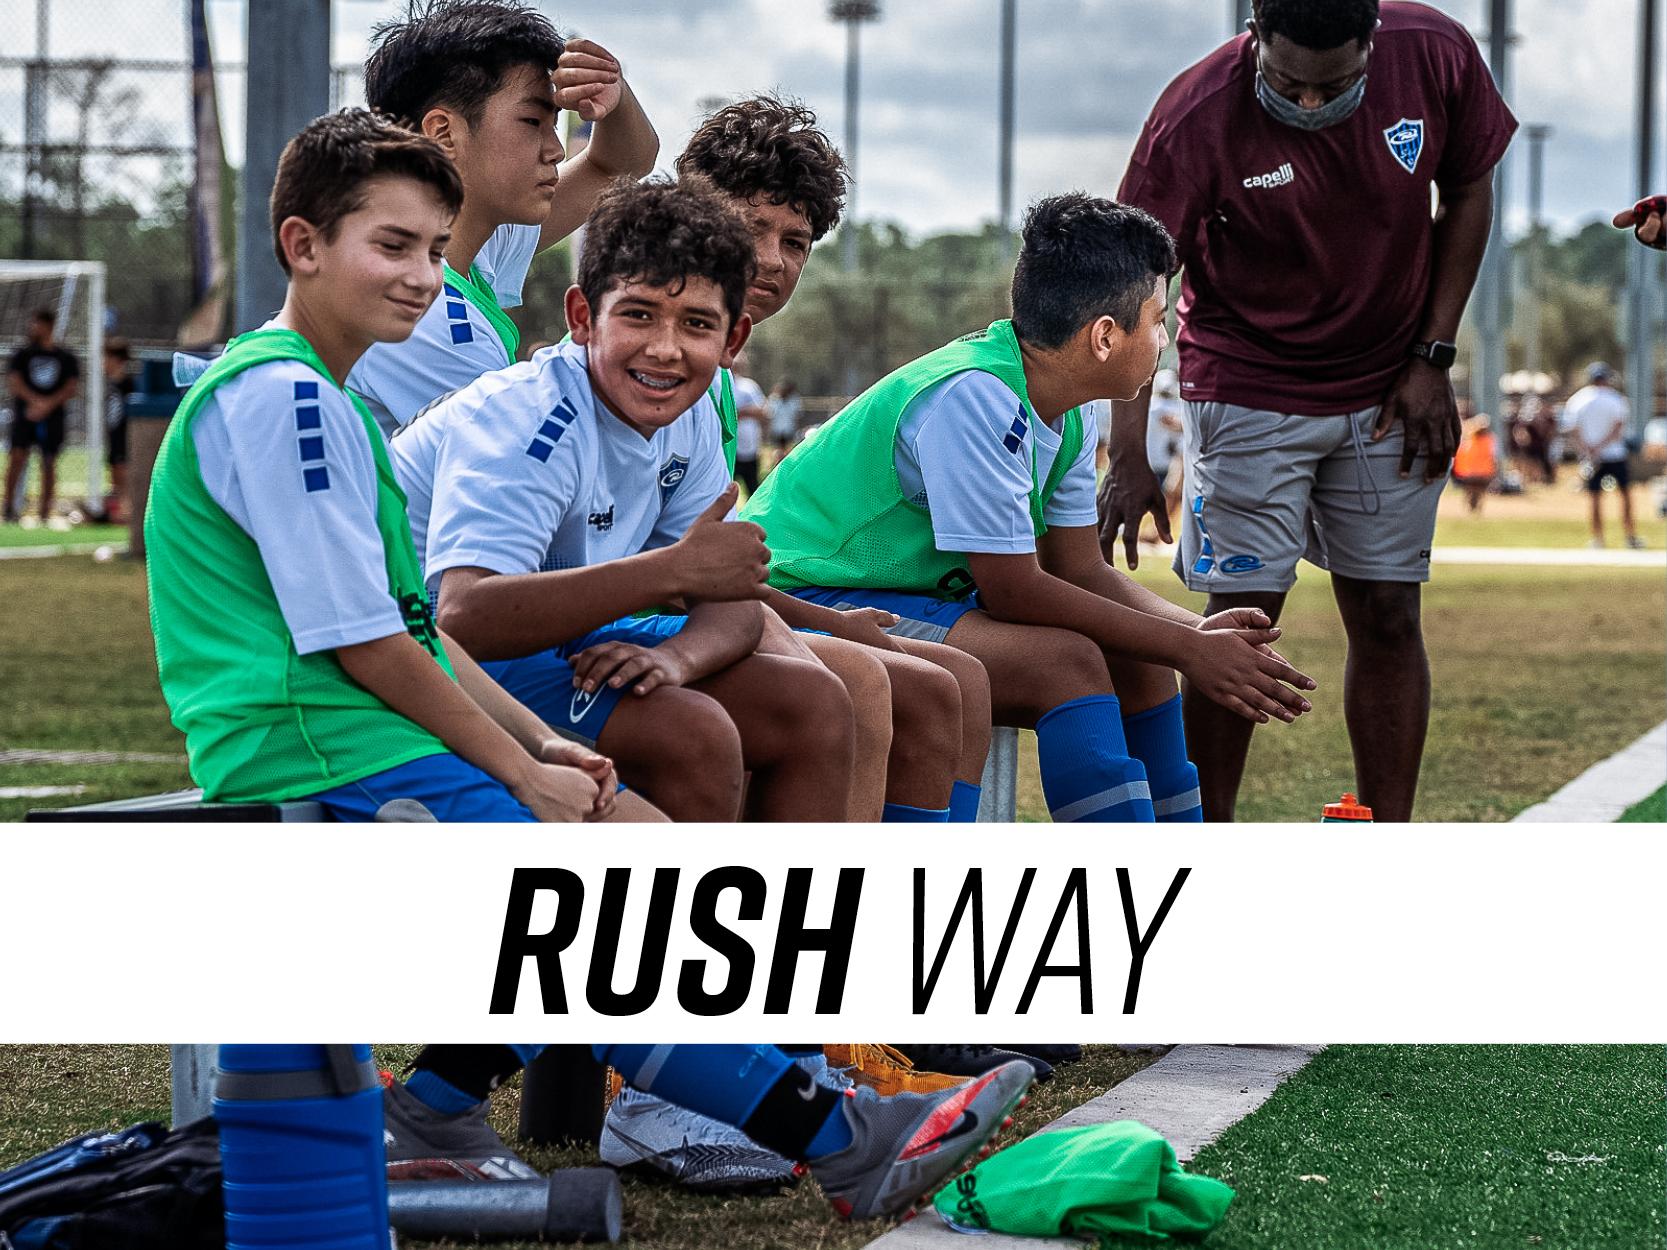 RushWay